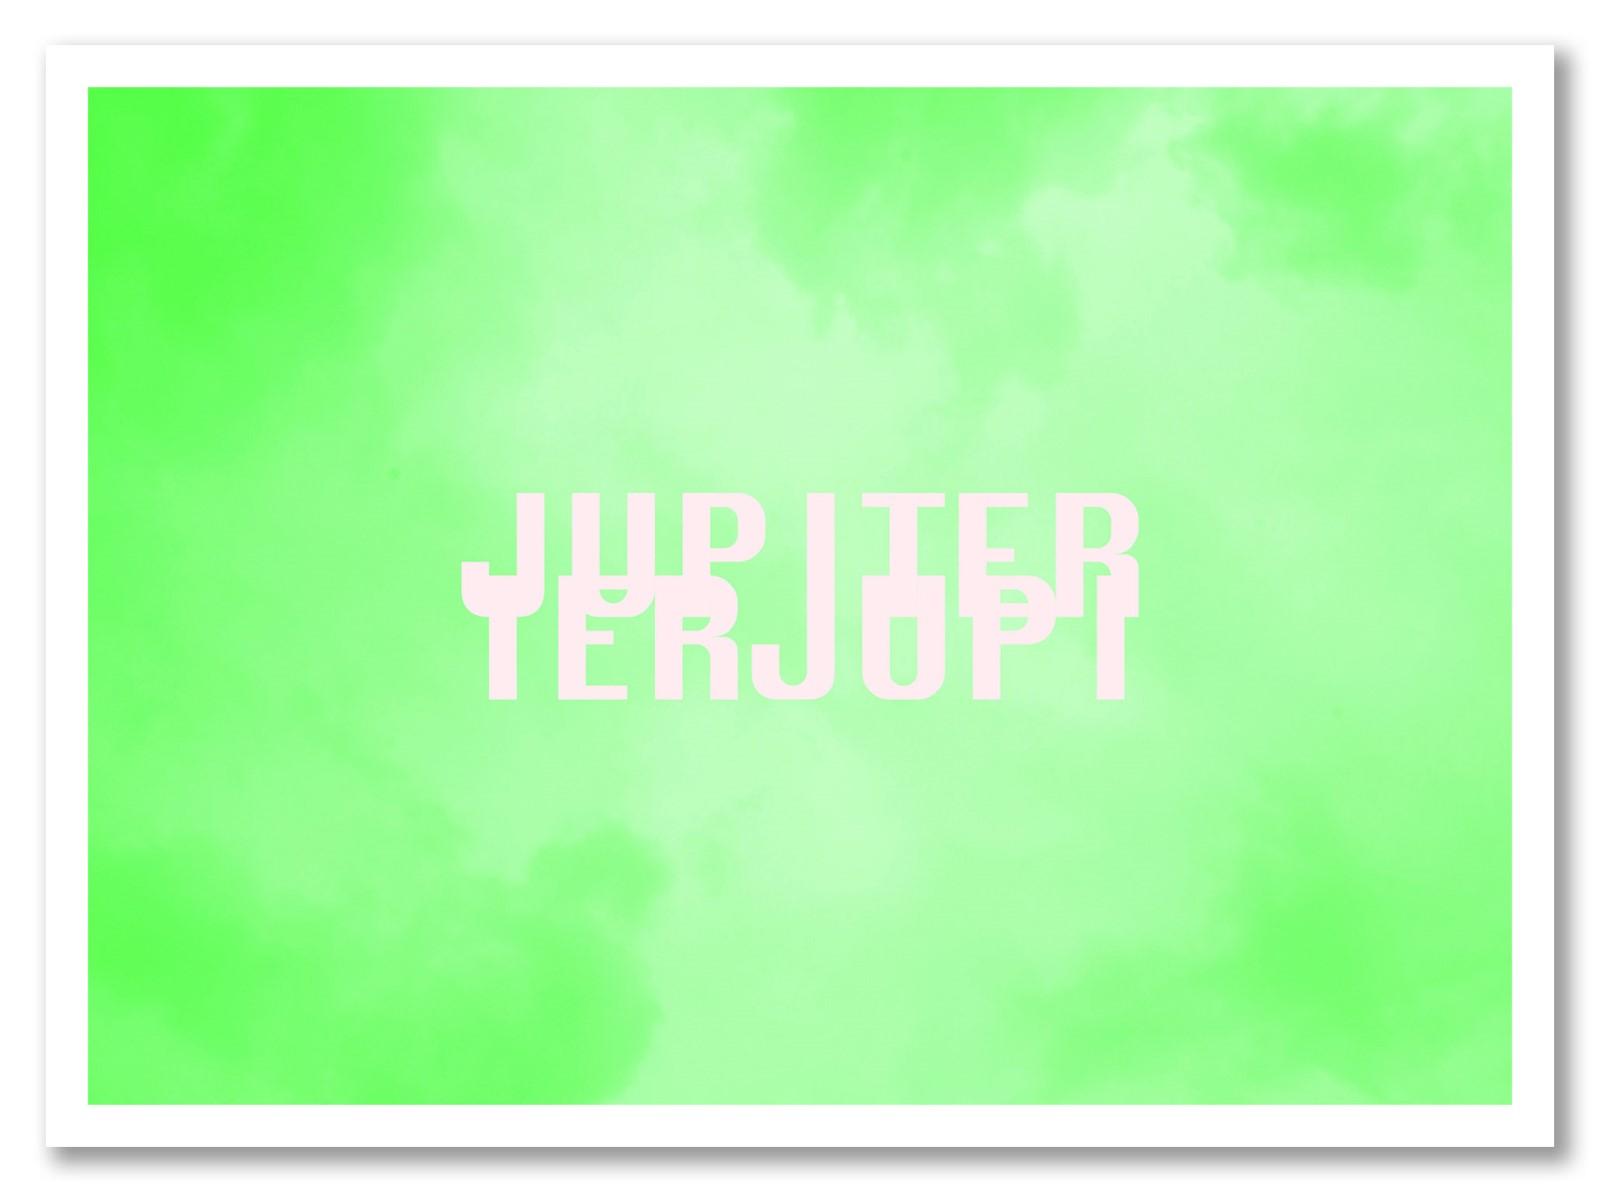 Design - Jupiter Vert